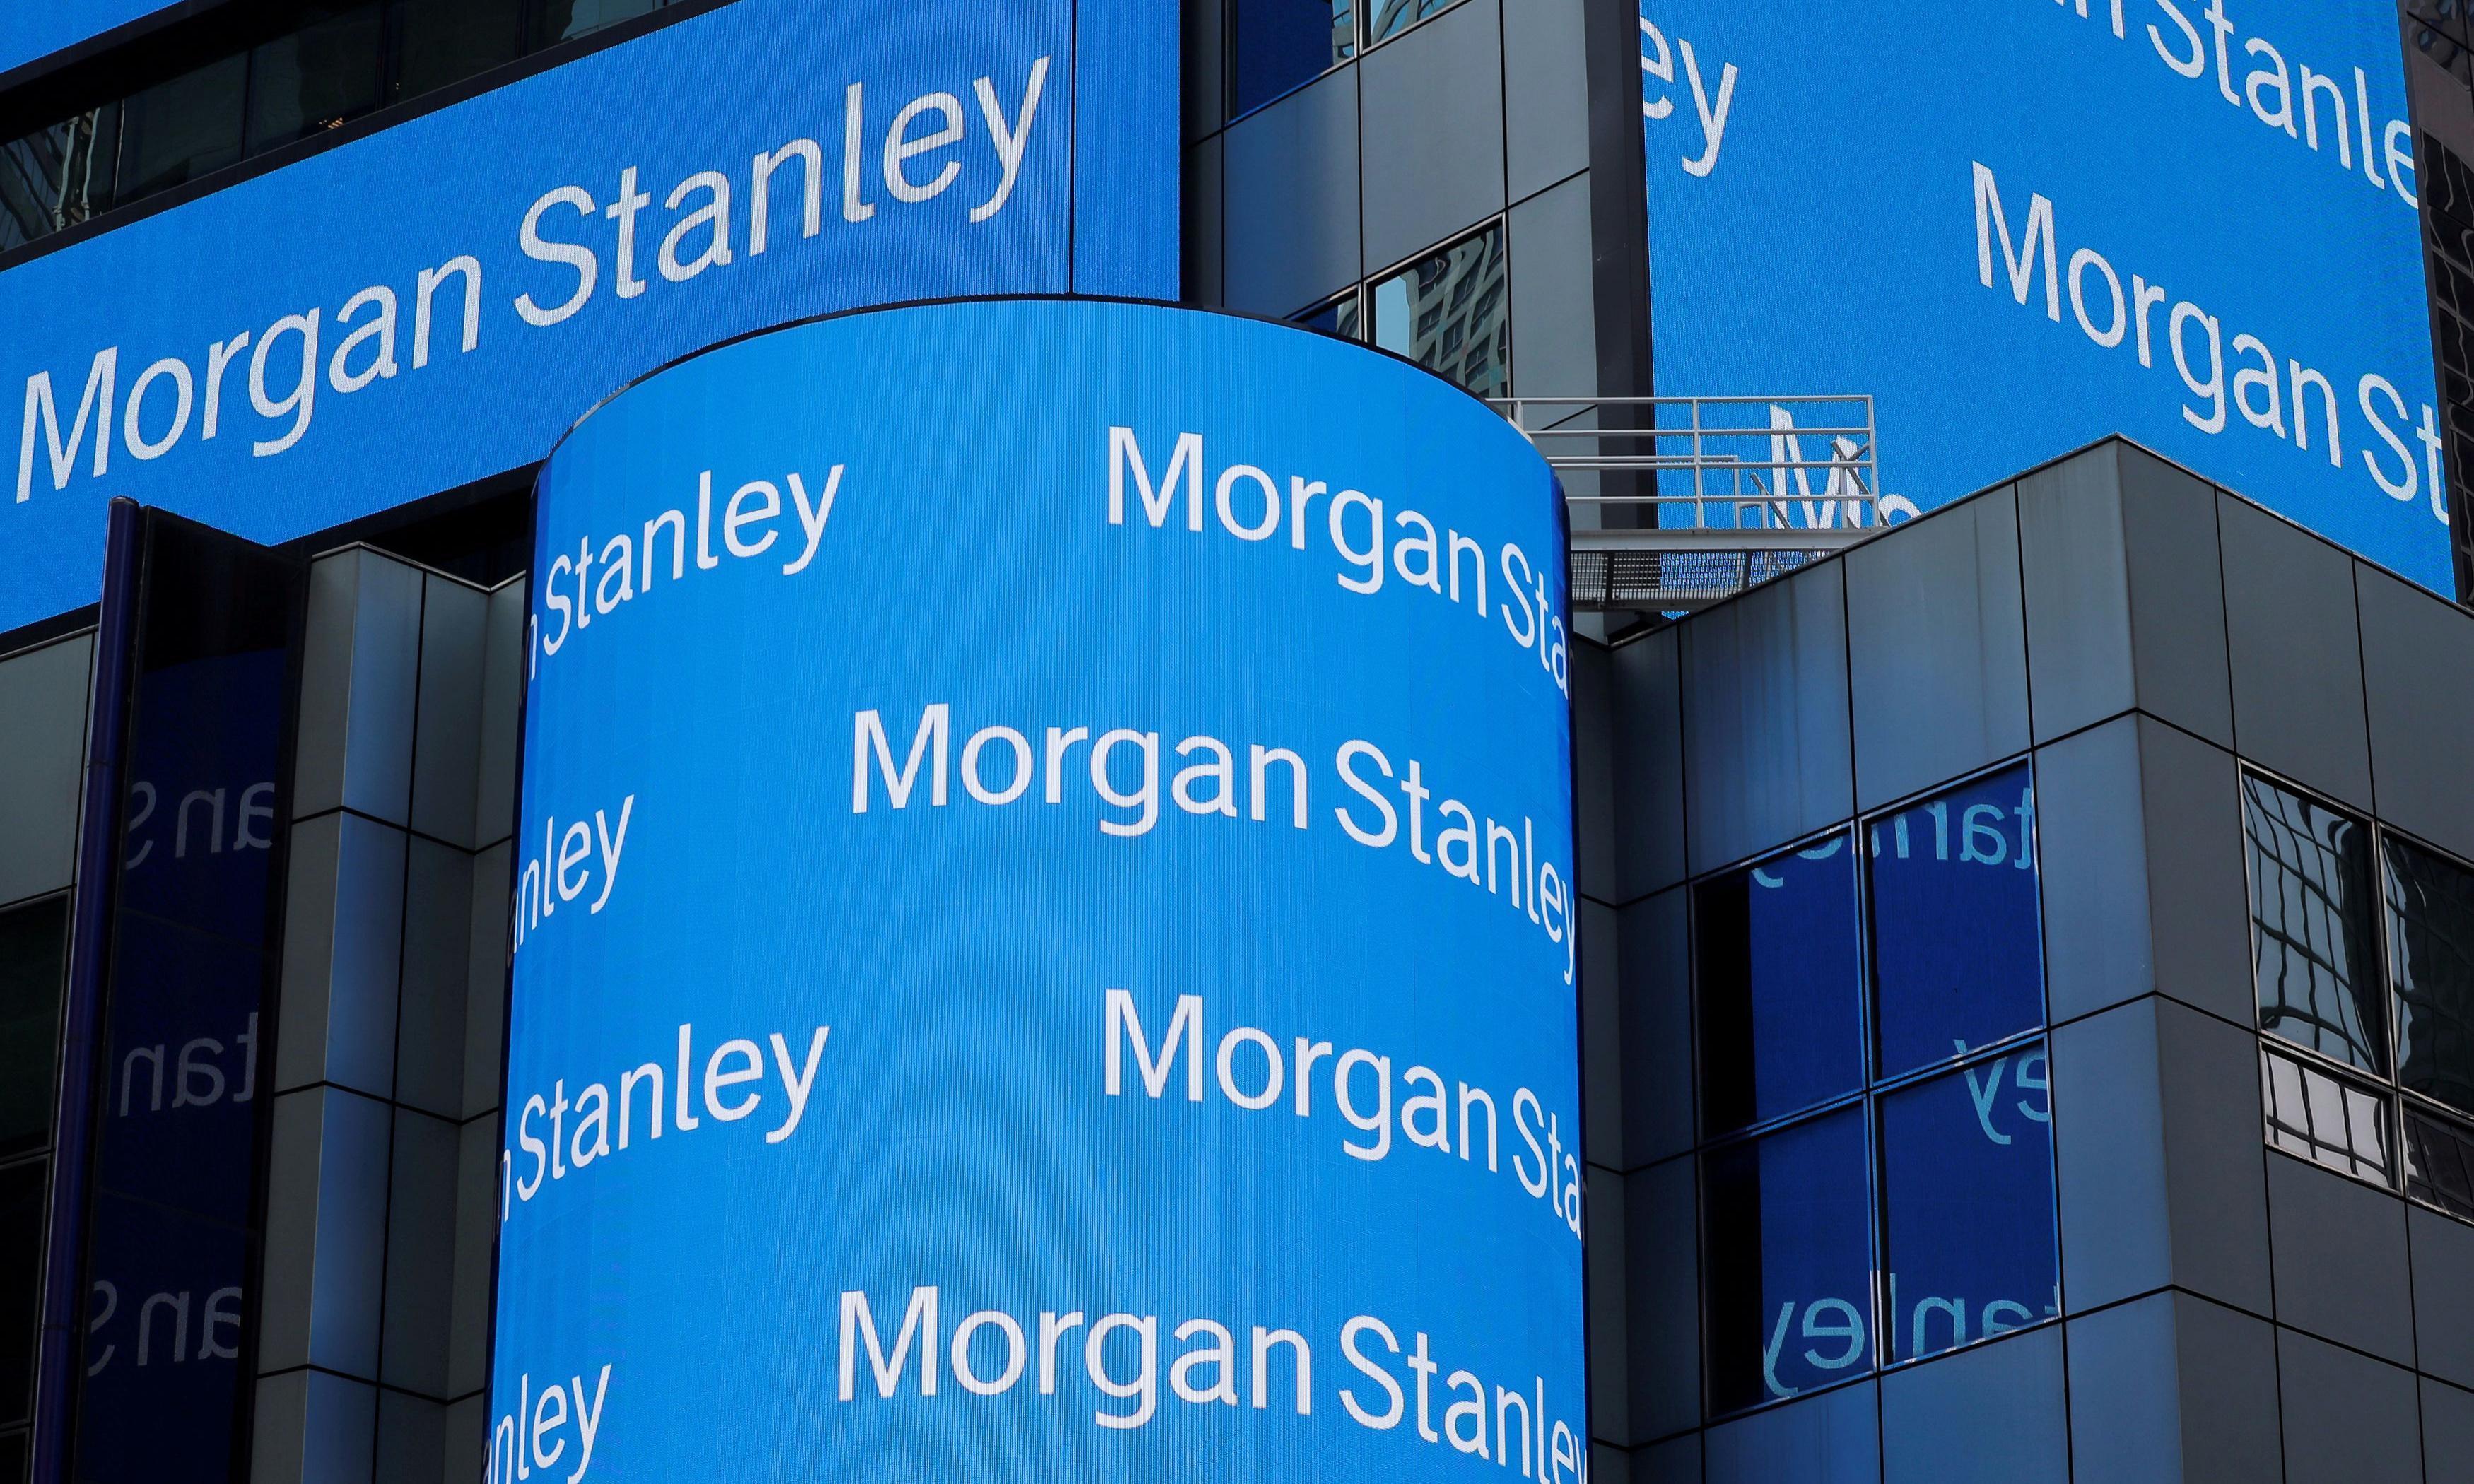 Morgan Stanley to buy online brokerage E-Trade for $13bn